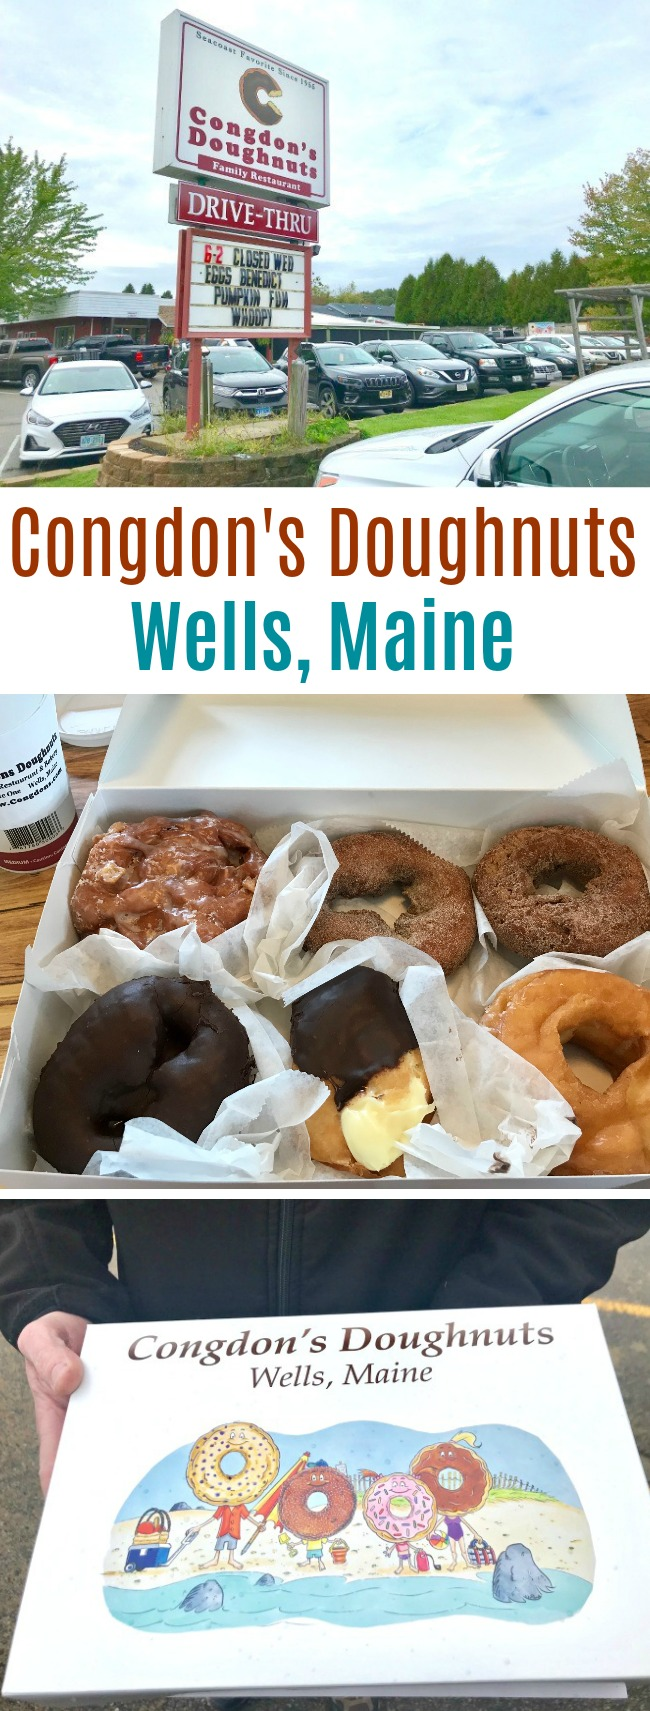 Congdon's Doughnuts – Wells, Maine